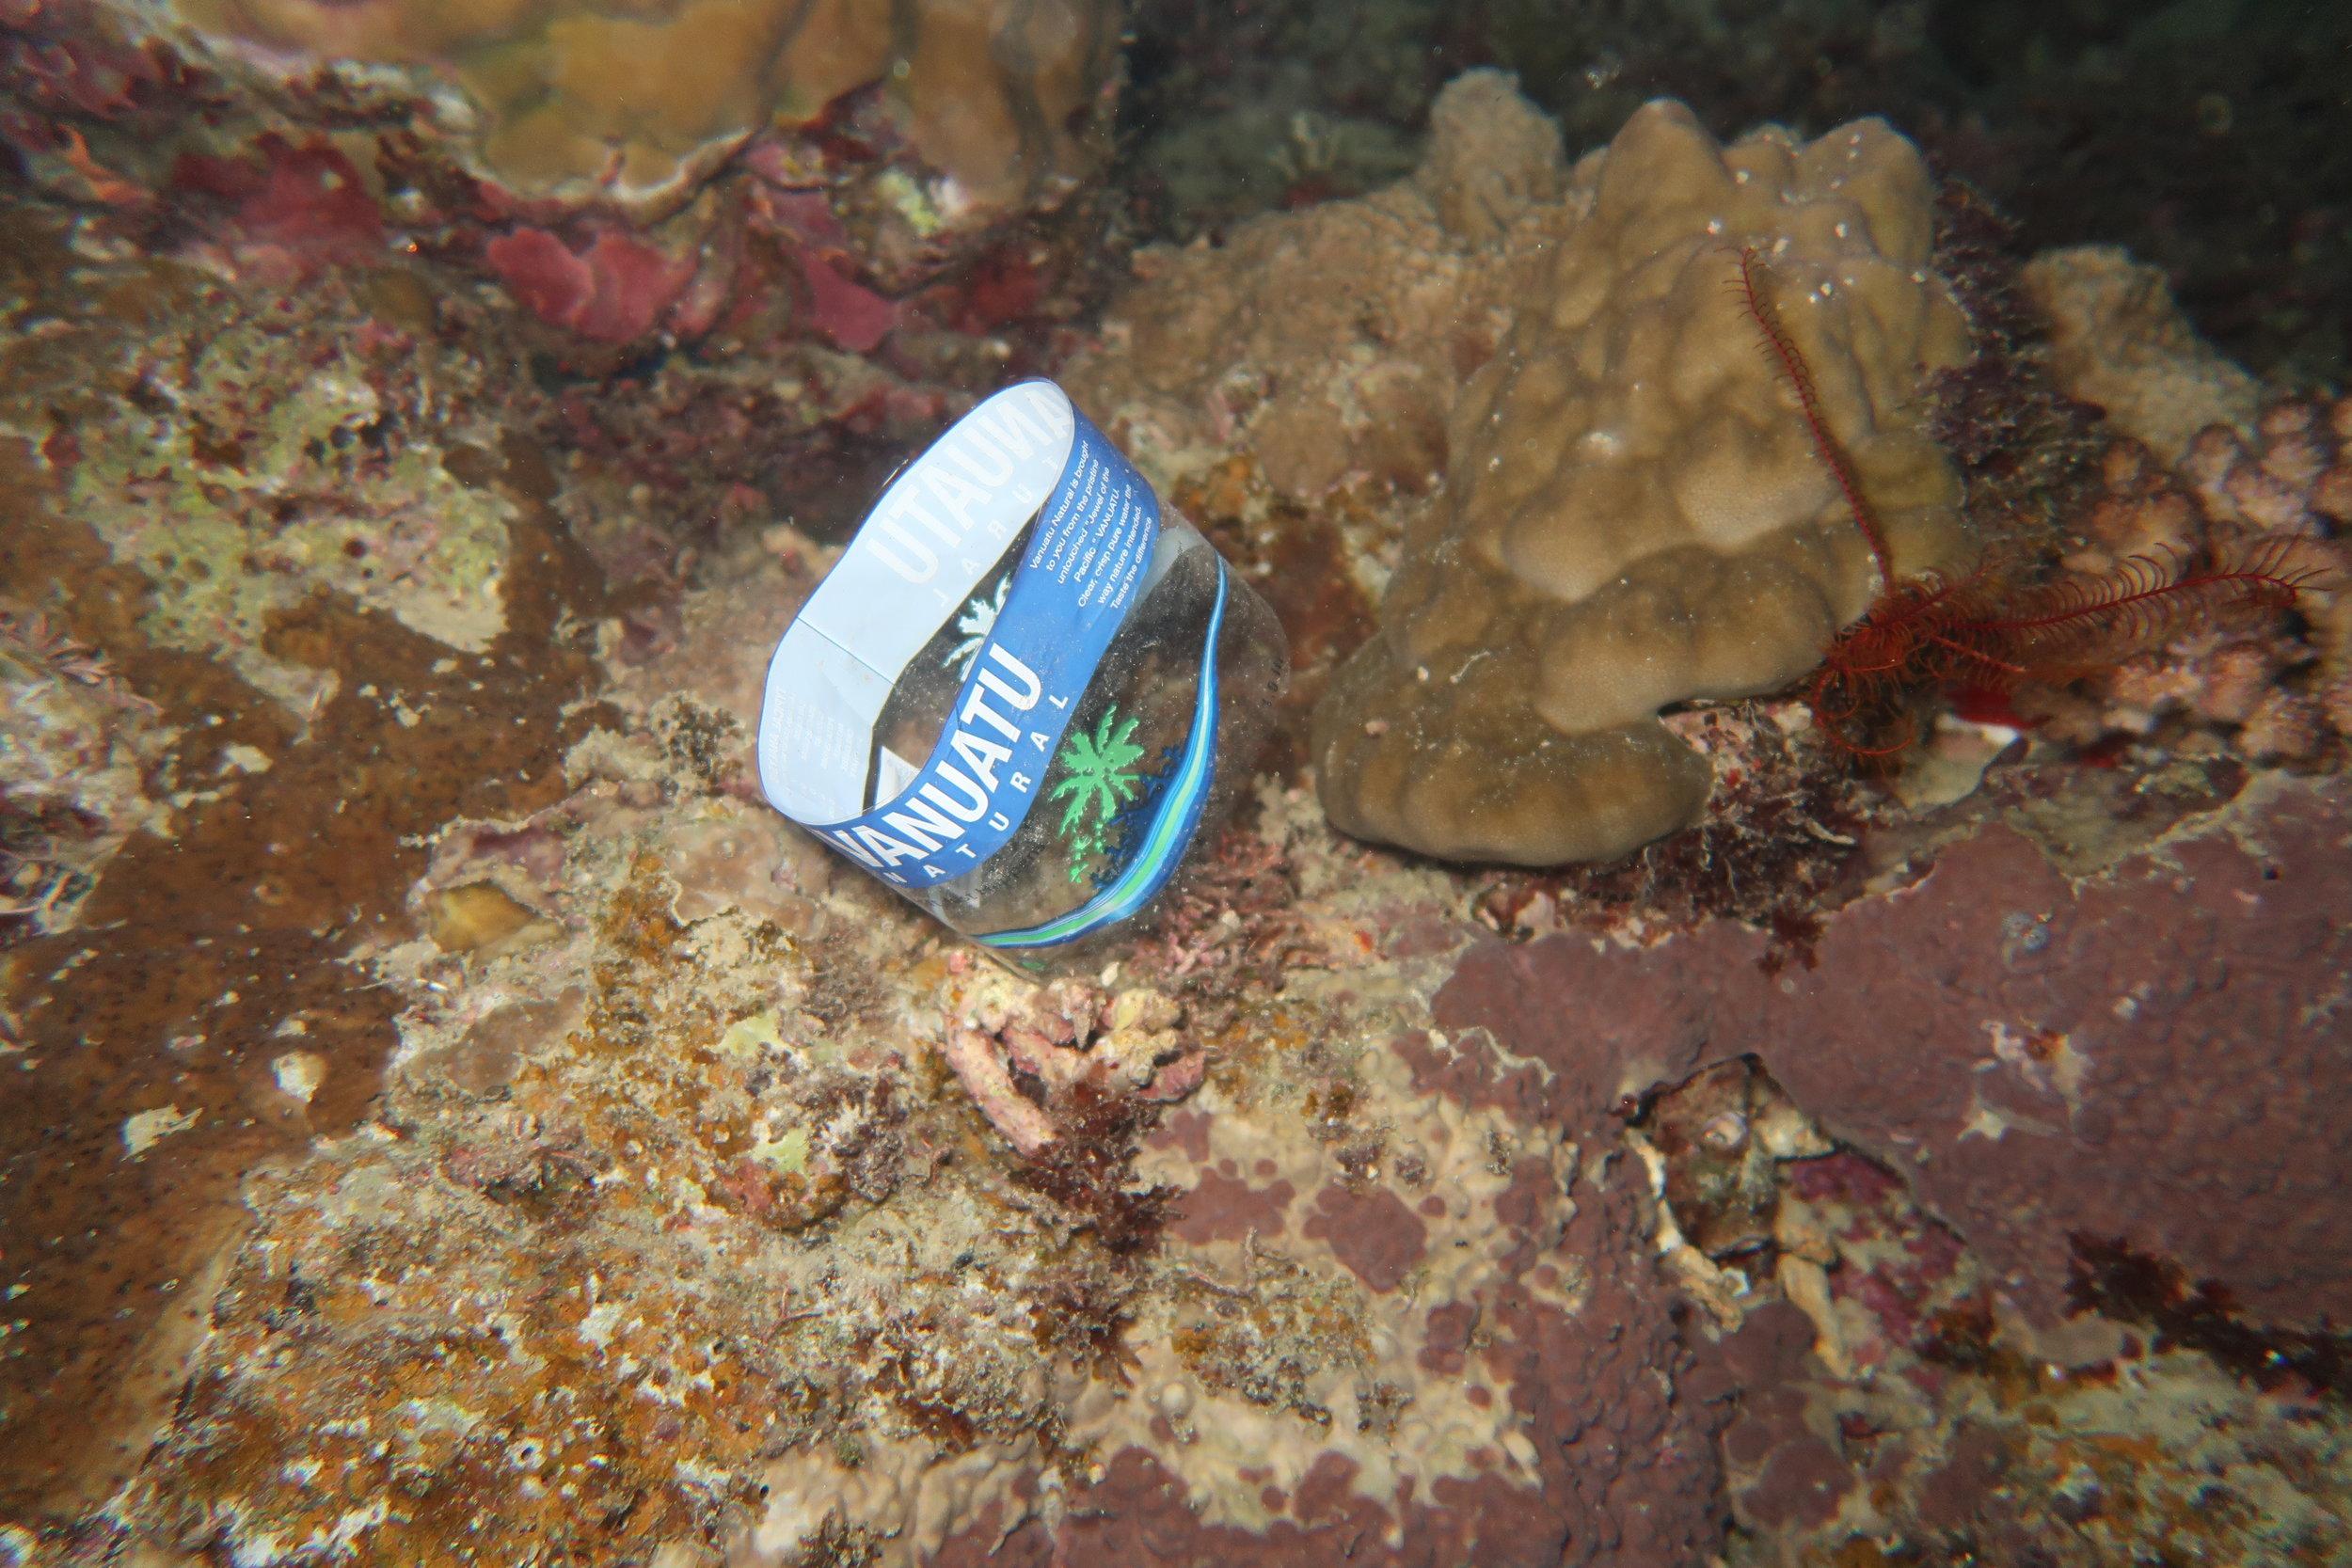 Plastic finds it way into all marine environments. Photo: Andy Osborne @osbornandy